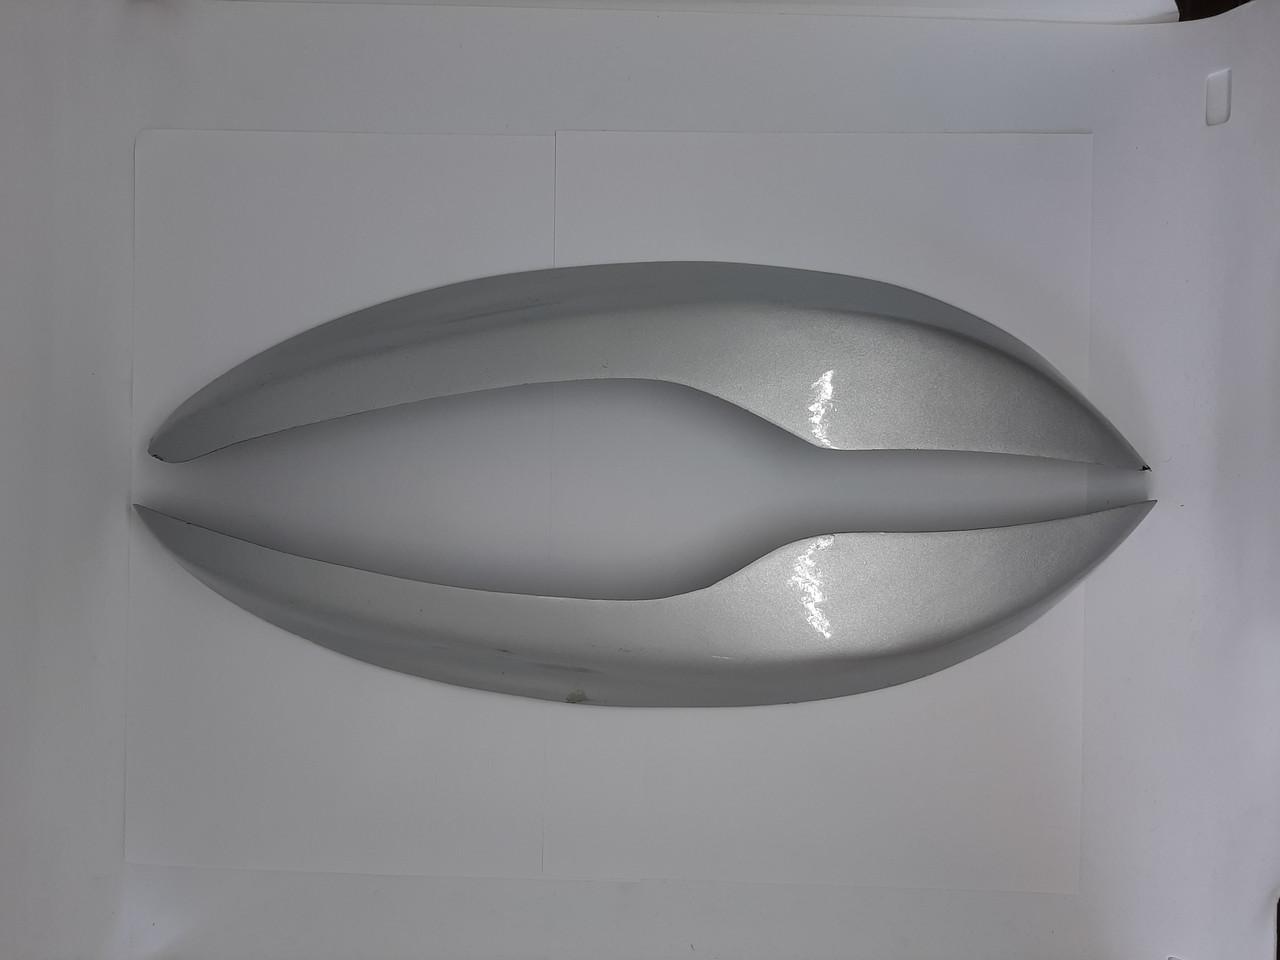 Накладки (реснички) на передние фары Нива Шевроле 2123 (серого цвета)